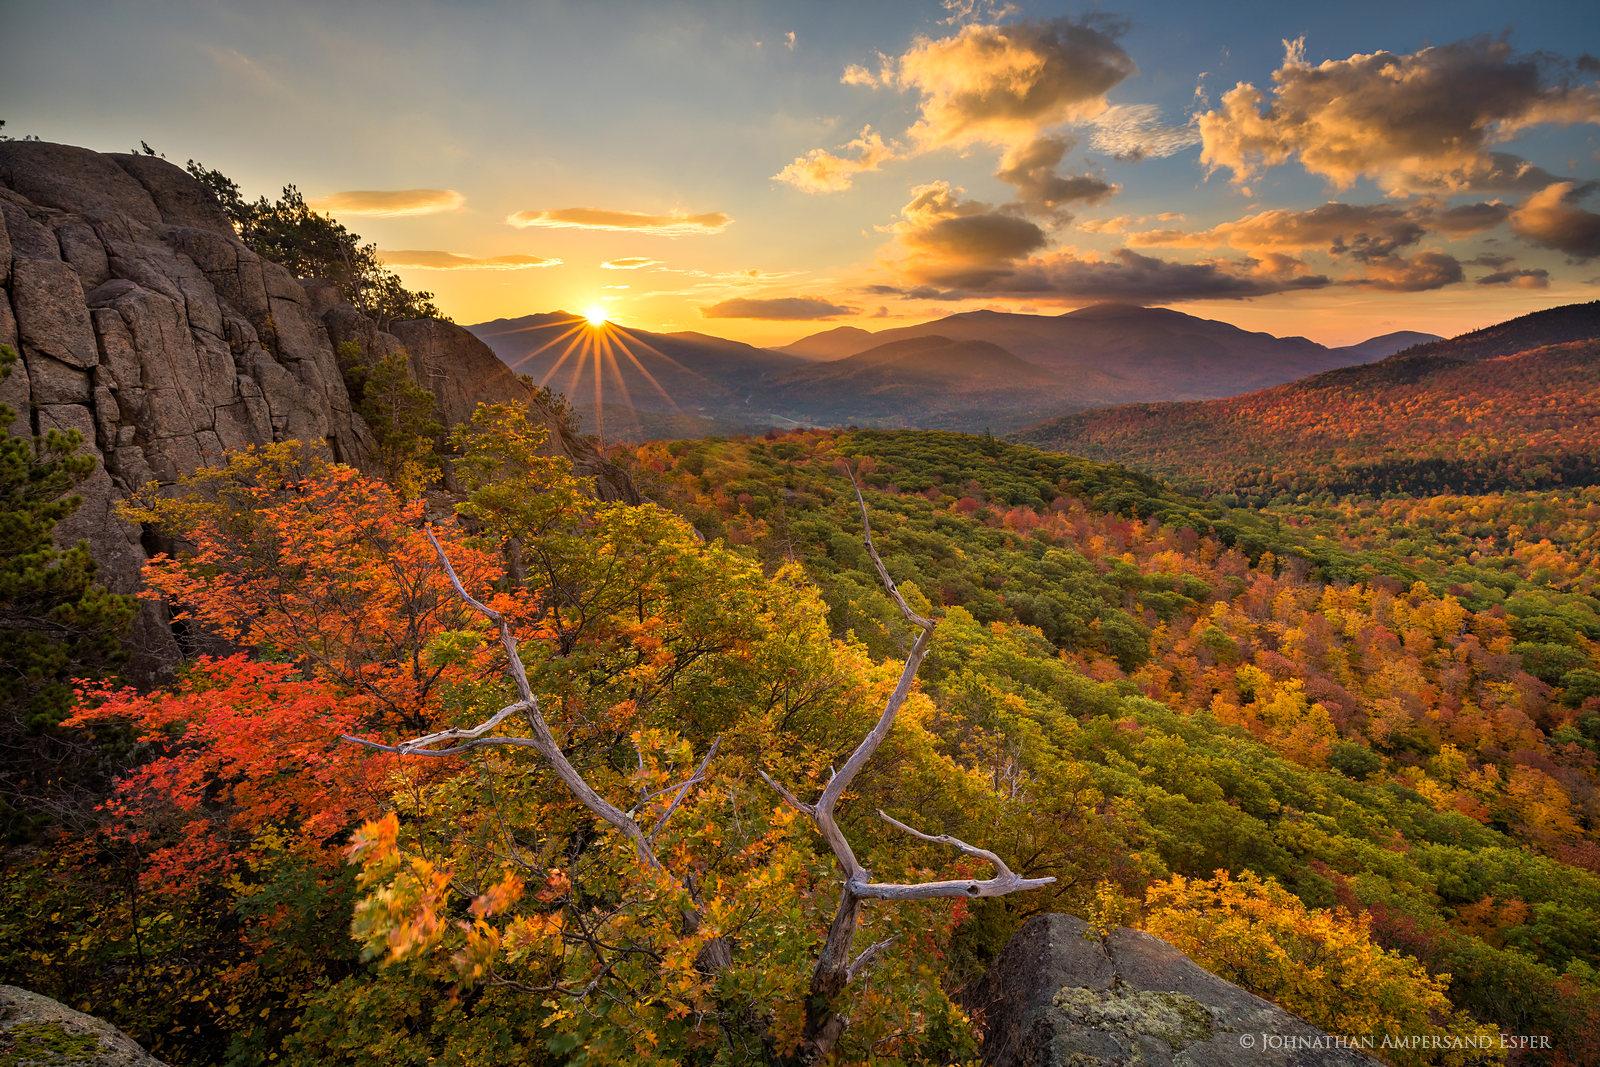 Owls Head Mt.,Owl's Head Mt.,Owl's Head Mt,Owls Head Mt,Owls Head,summit,Owls Head Mt summit,sunrise,fall,2018,Giant Mt,Keene Valley,Adirondack Mountains,High Peaks,Adirondacks,Adirondack,photography,, photo